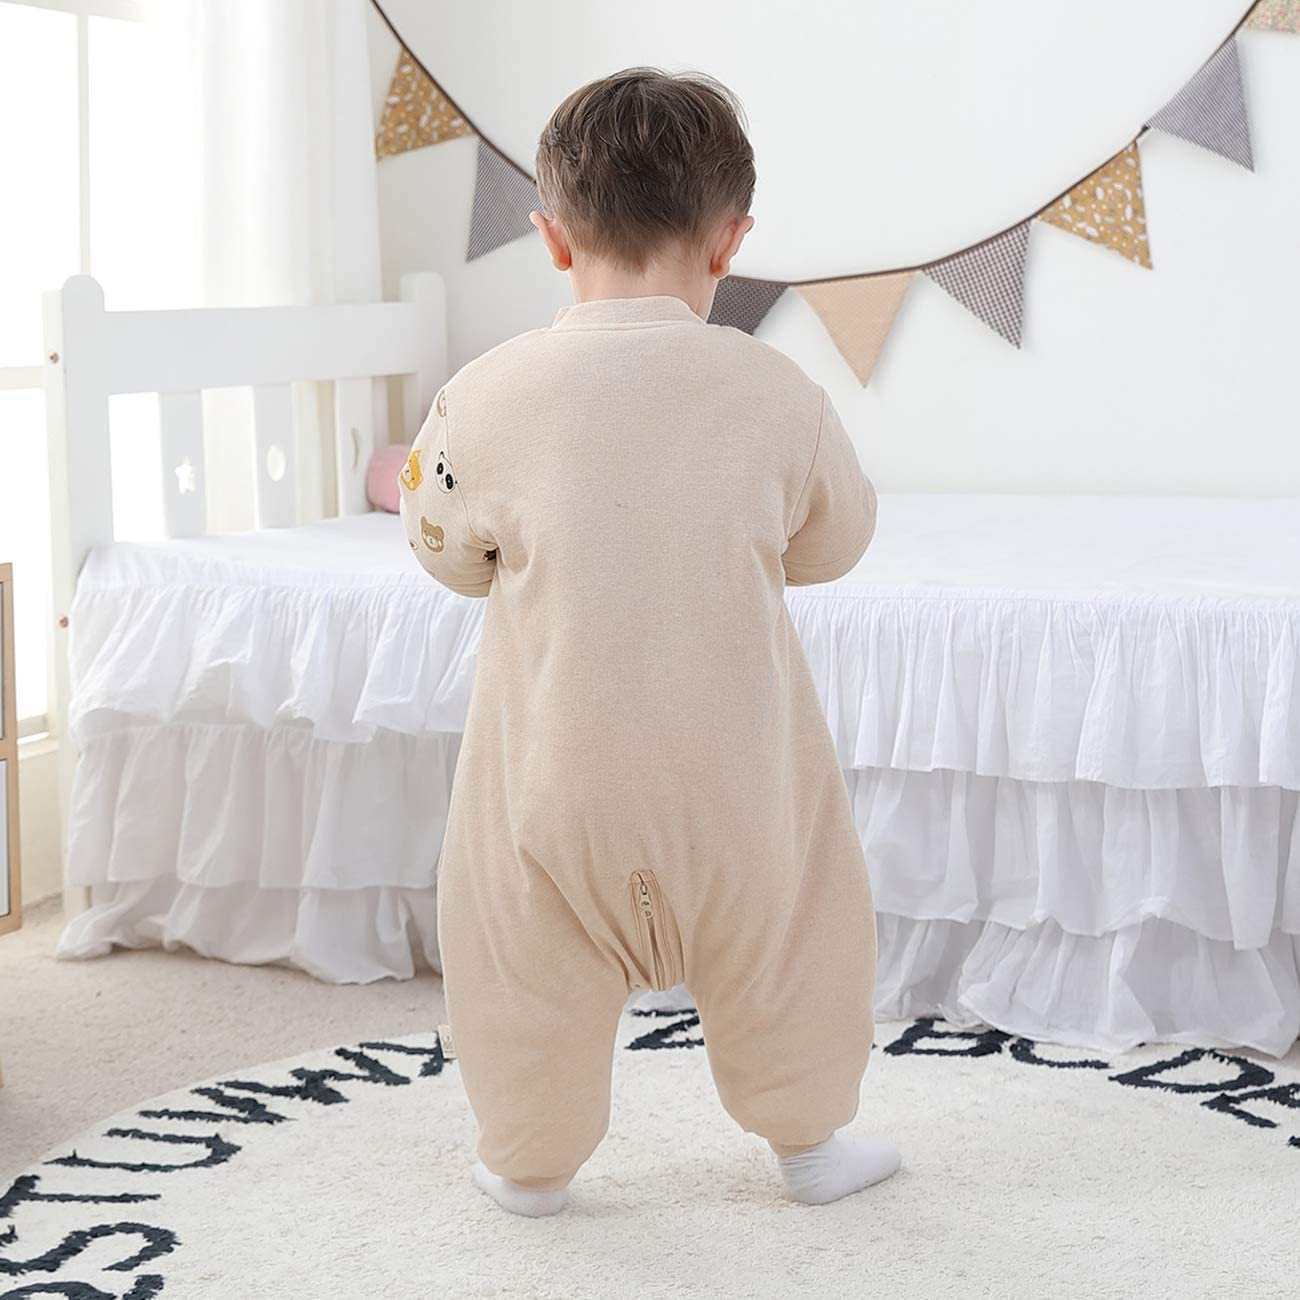 Baby Sleeping Bag with Legs Warmly Lined Winter Childrens Sleeping Bag Removable Sleeves boy Girl Unisex Pyjamas